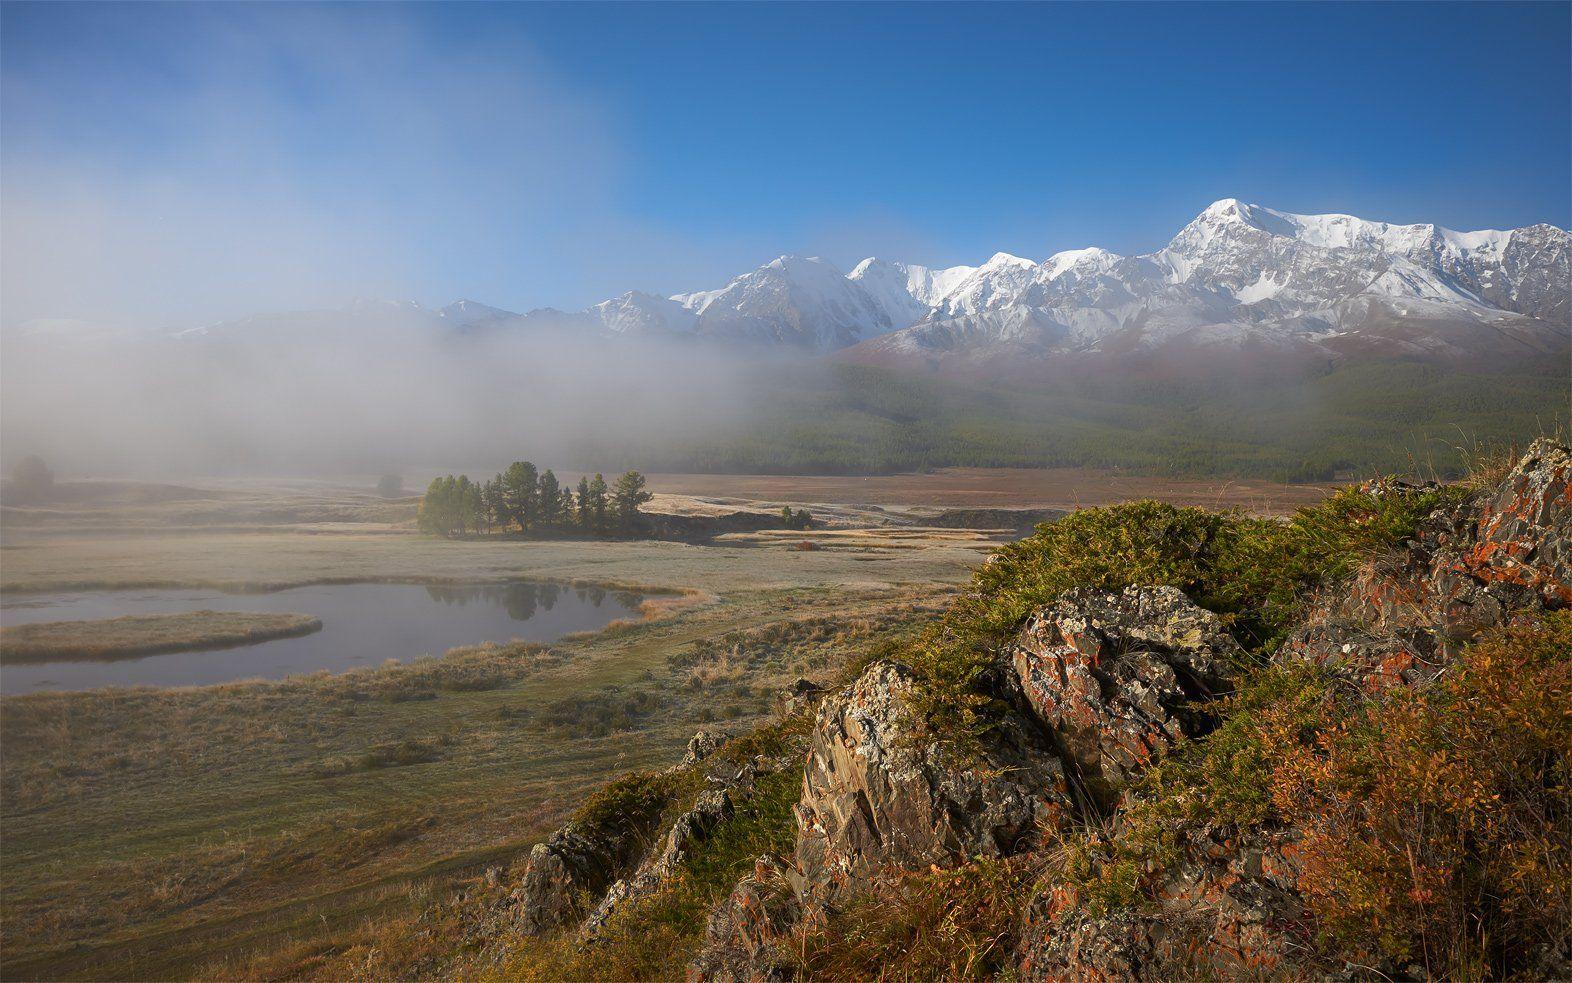 алтай, северо-чуйский хребет, урочище ештыкель, болото, туман, утро, куркурек, биш-иирду, alos